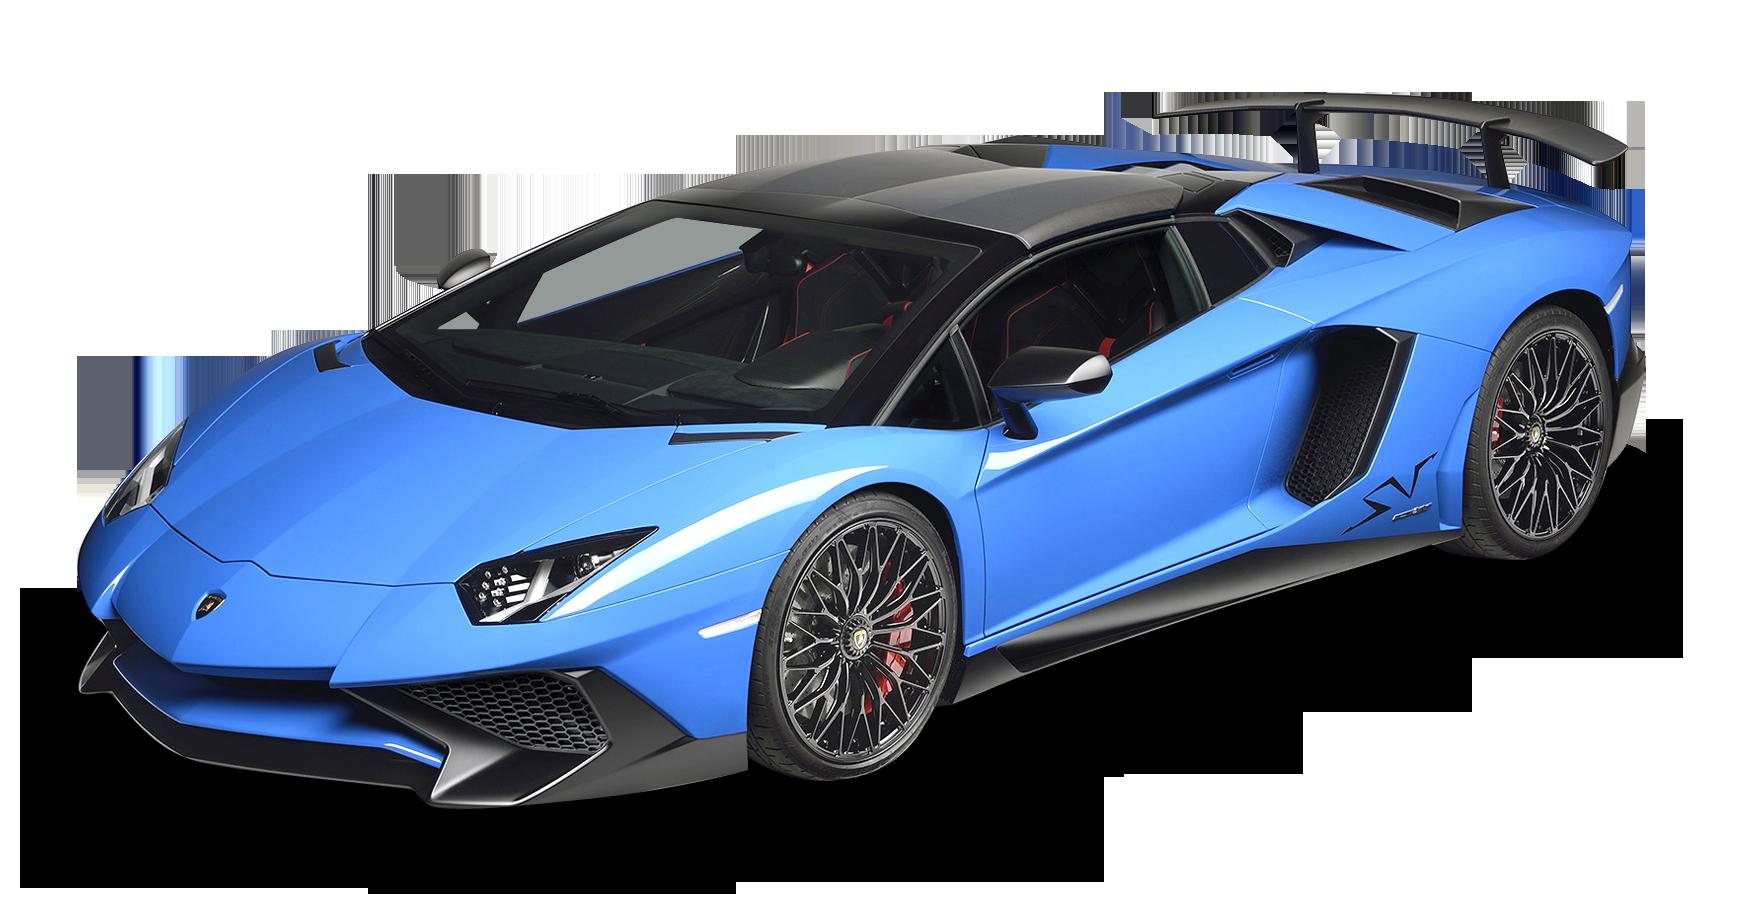 Blue Lamborghini Aventador Car PNG Image - PurePNG | Free ...